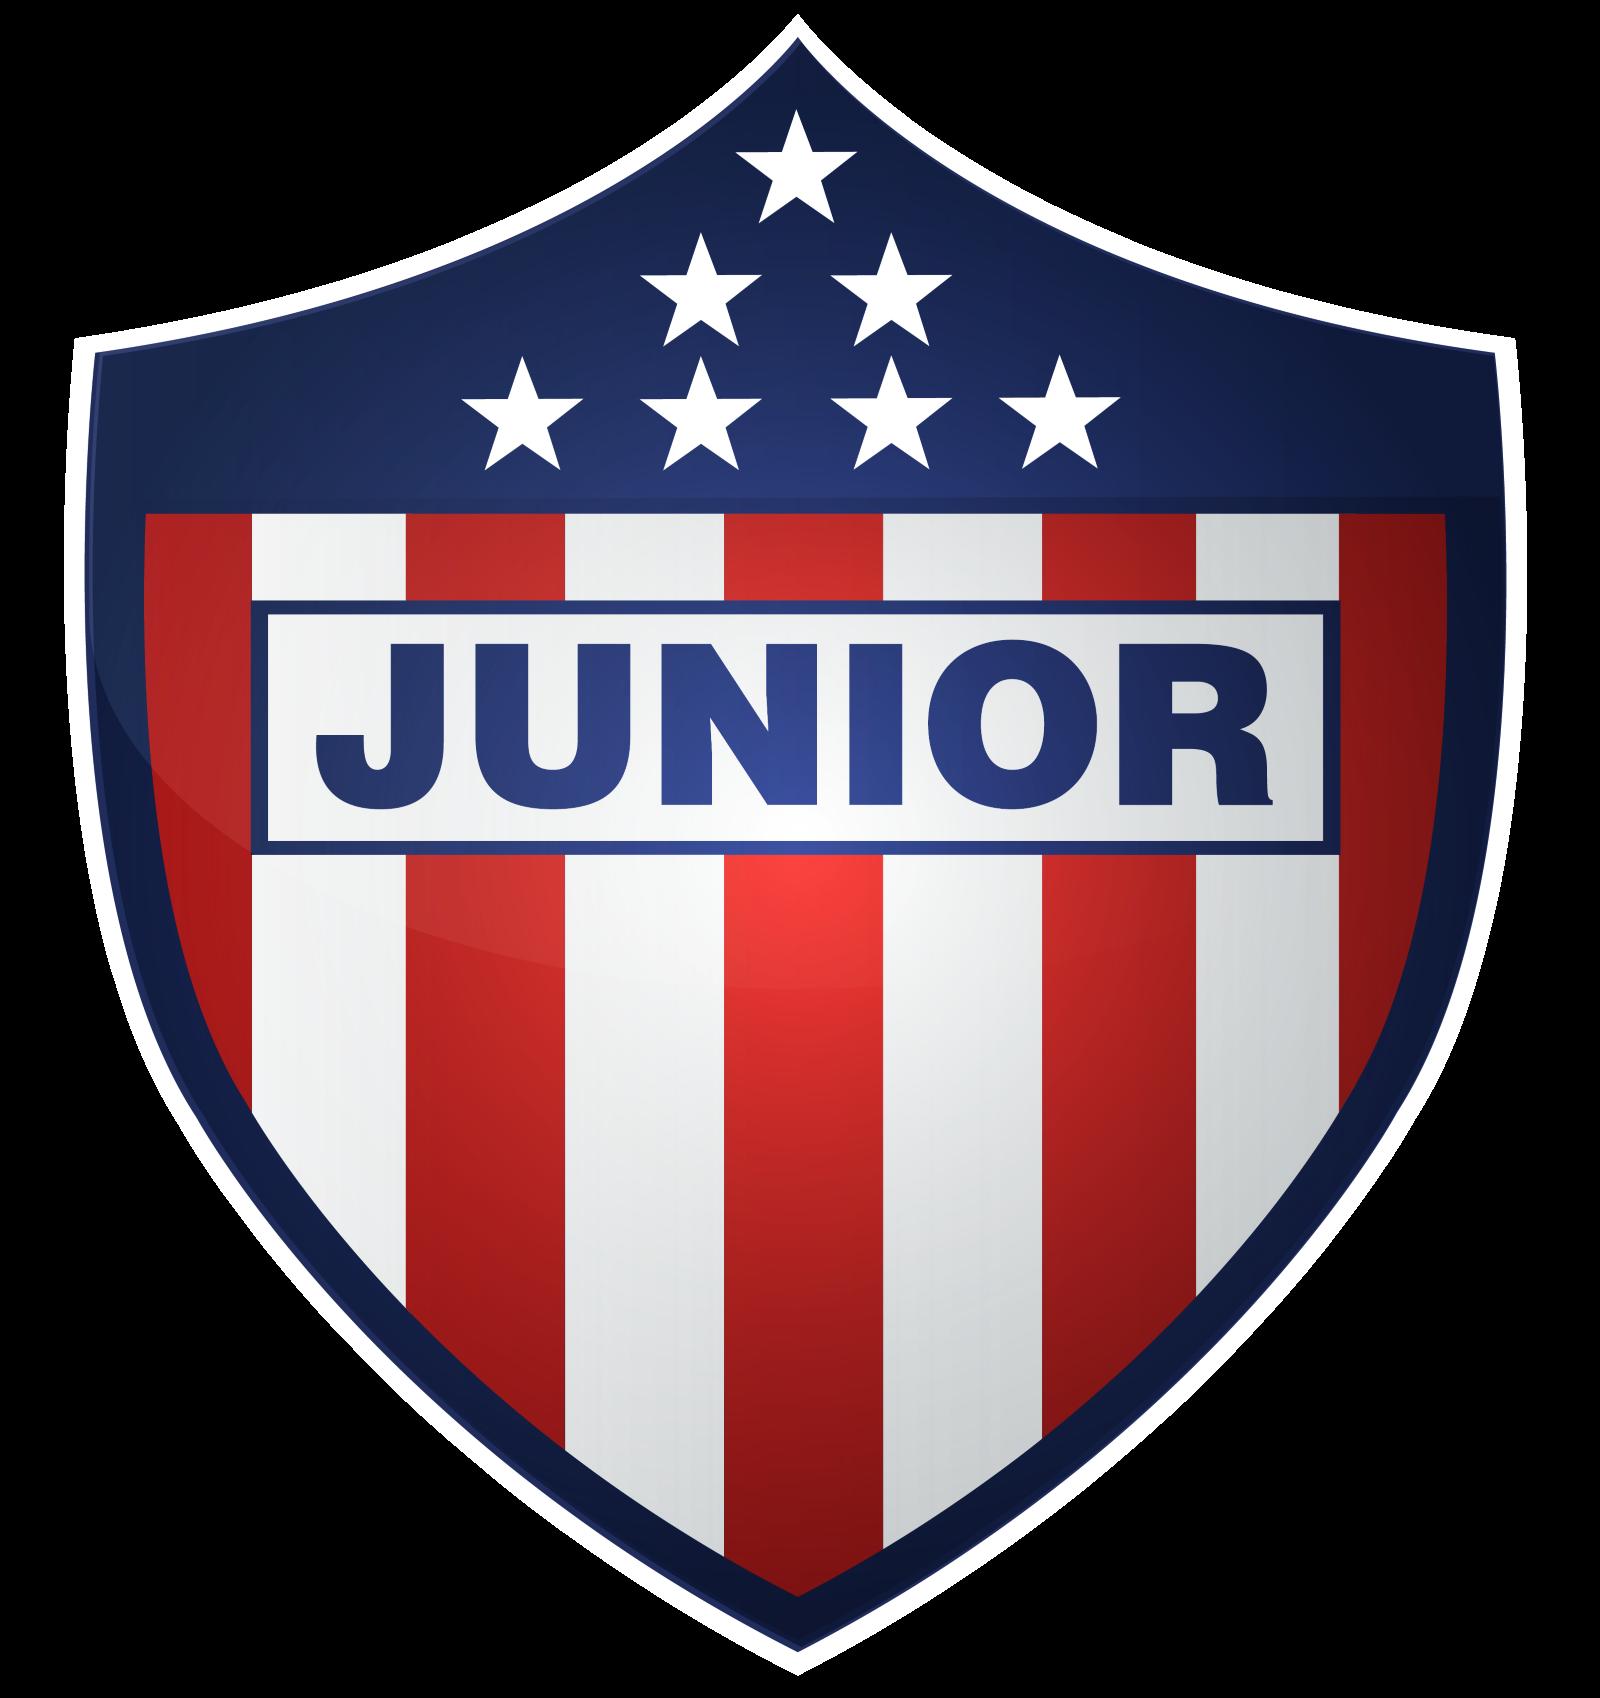 junior-de-barranquilla-logo-2